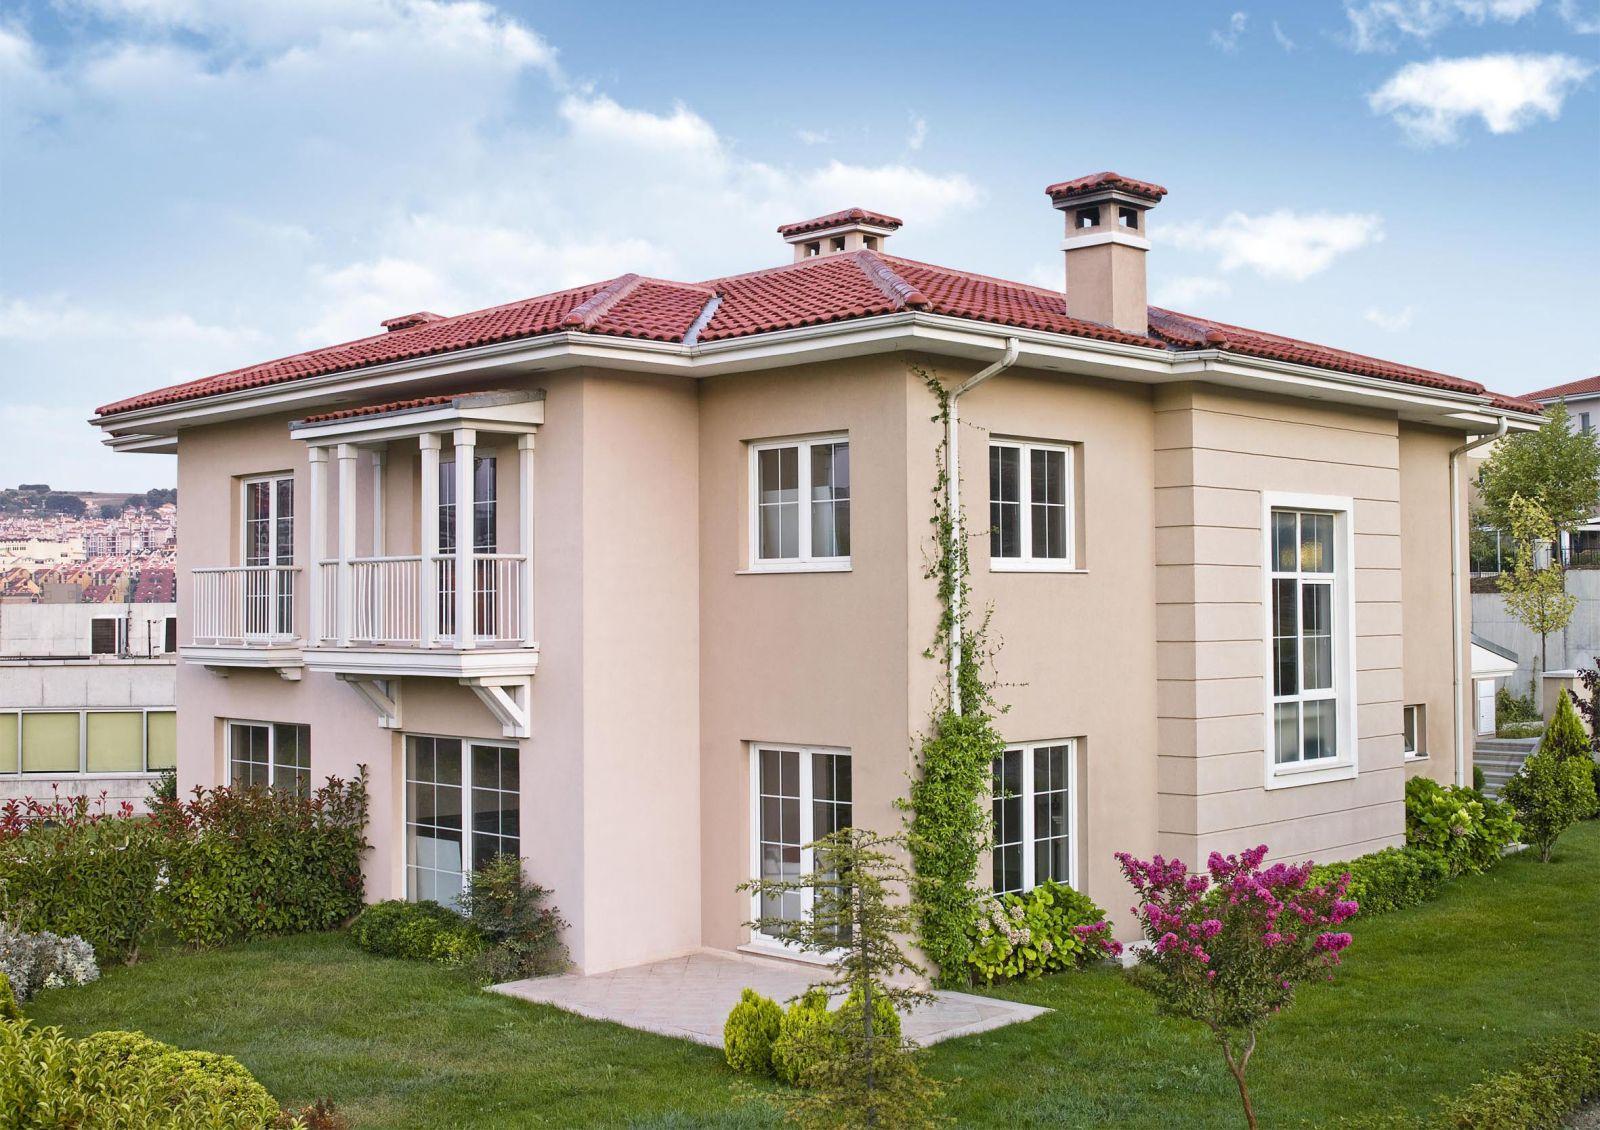 New Home Design Star Dreams Homes